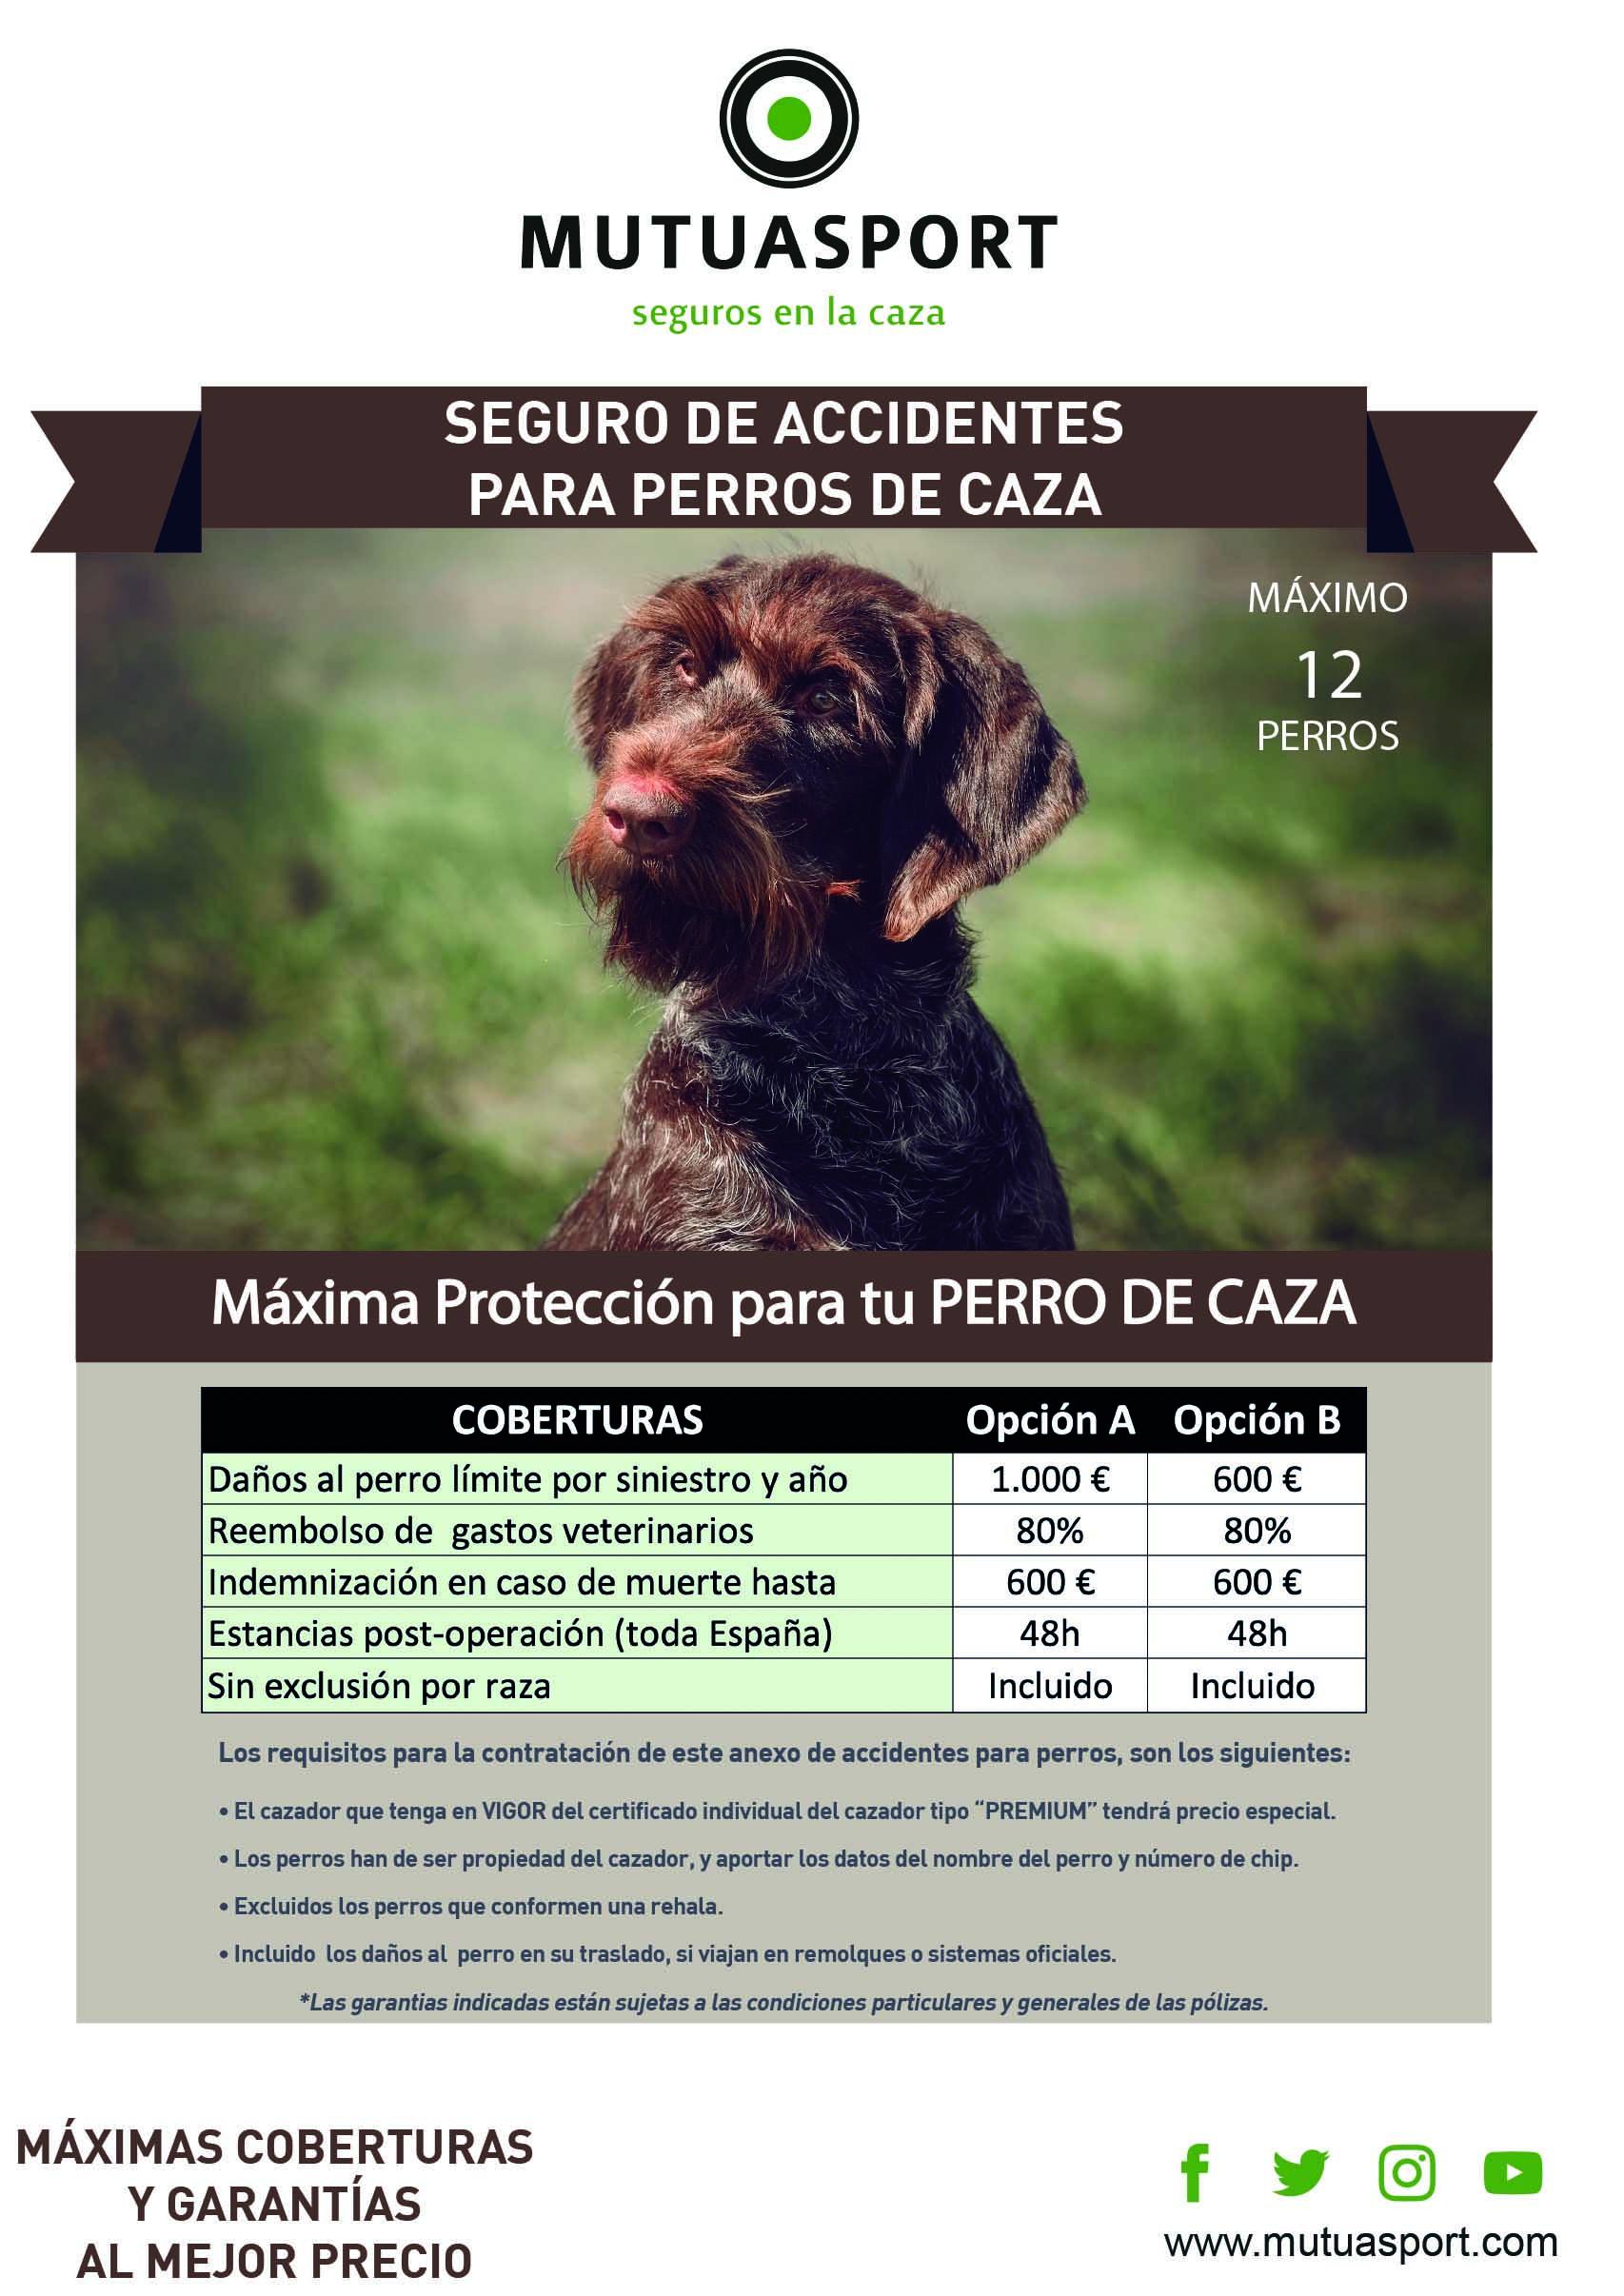 Seguro de ACCIDENTES PARA PERROS DE CAZA